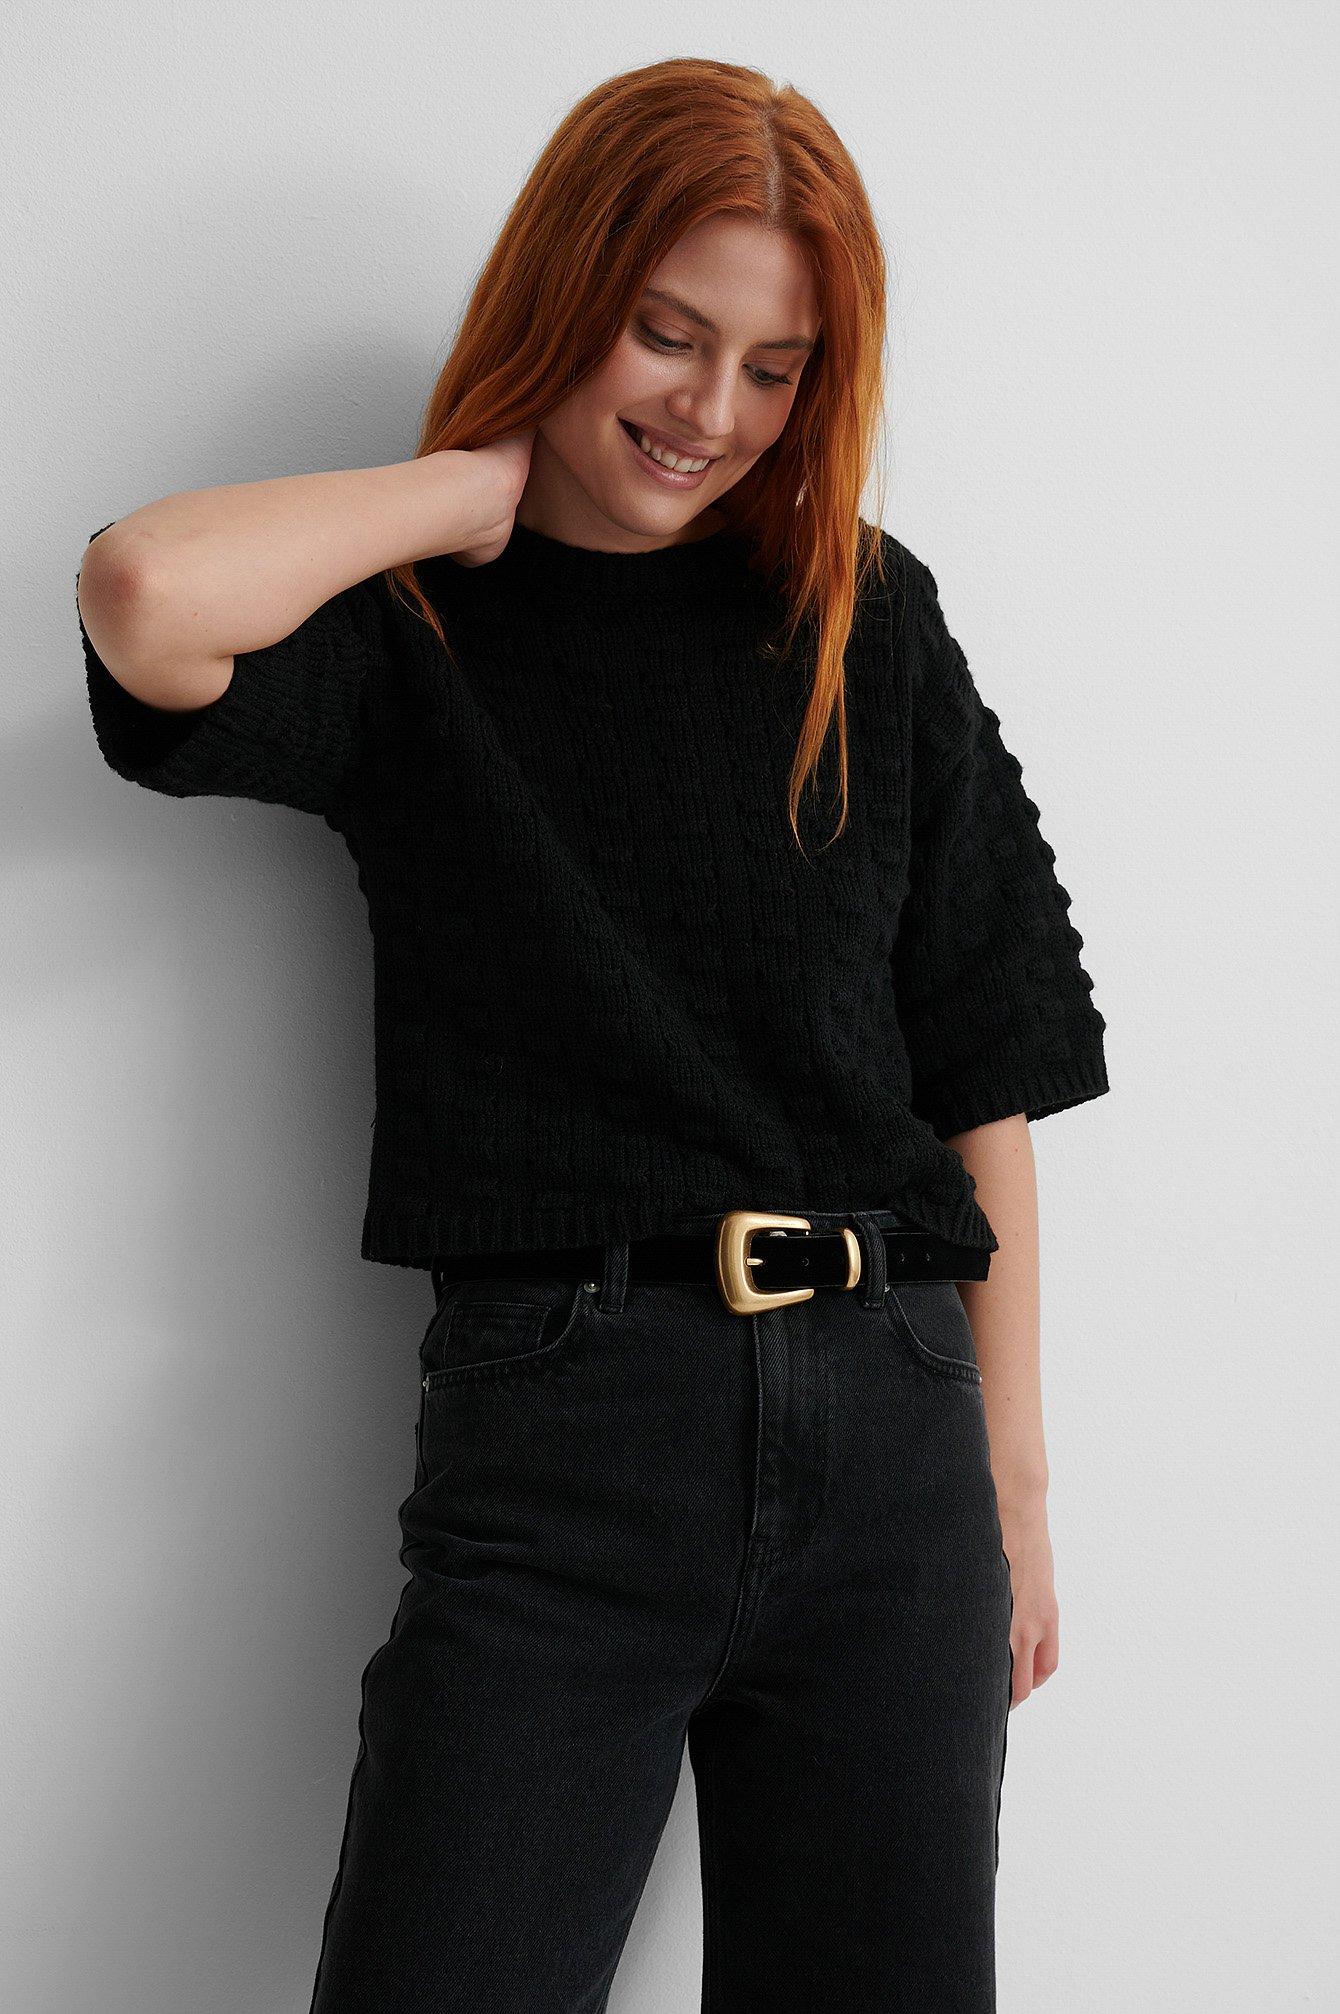 Se NA-KD Reborn Genanvendt Trøje Med Strikdetalje - Black ved NA-KD